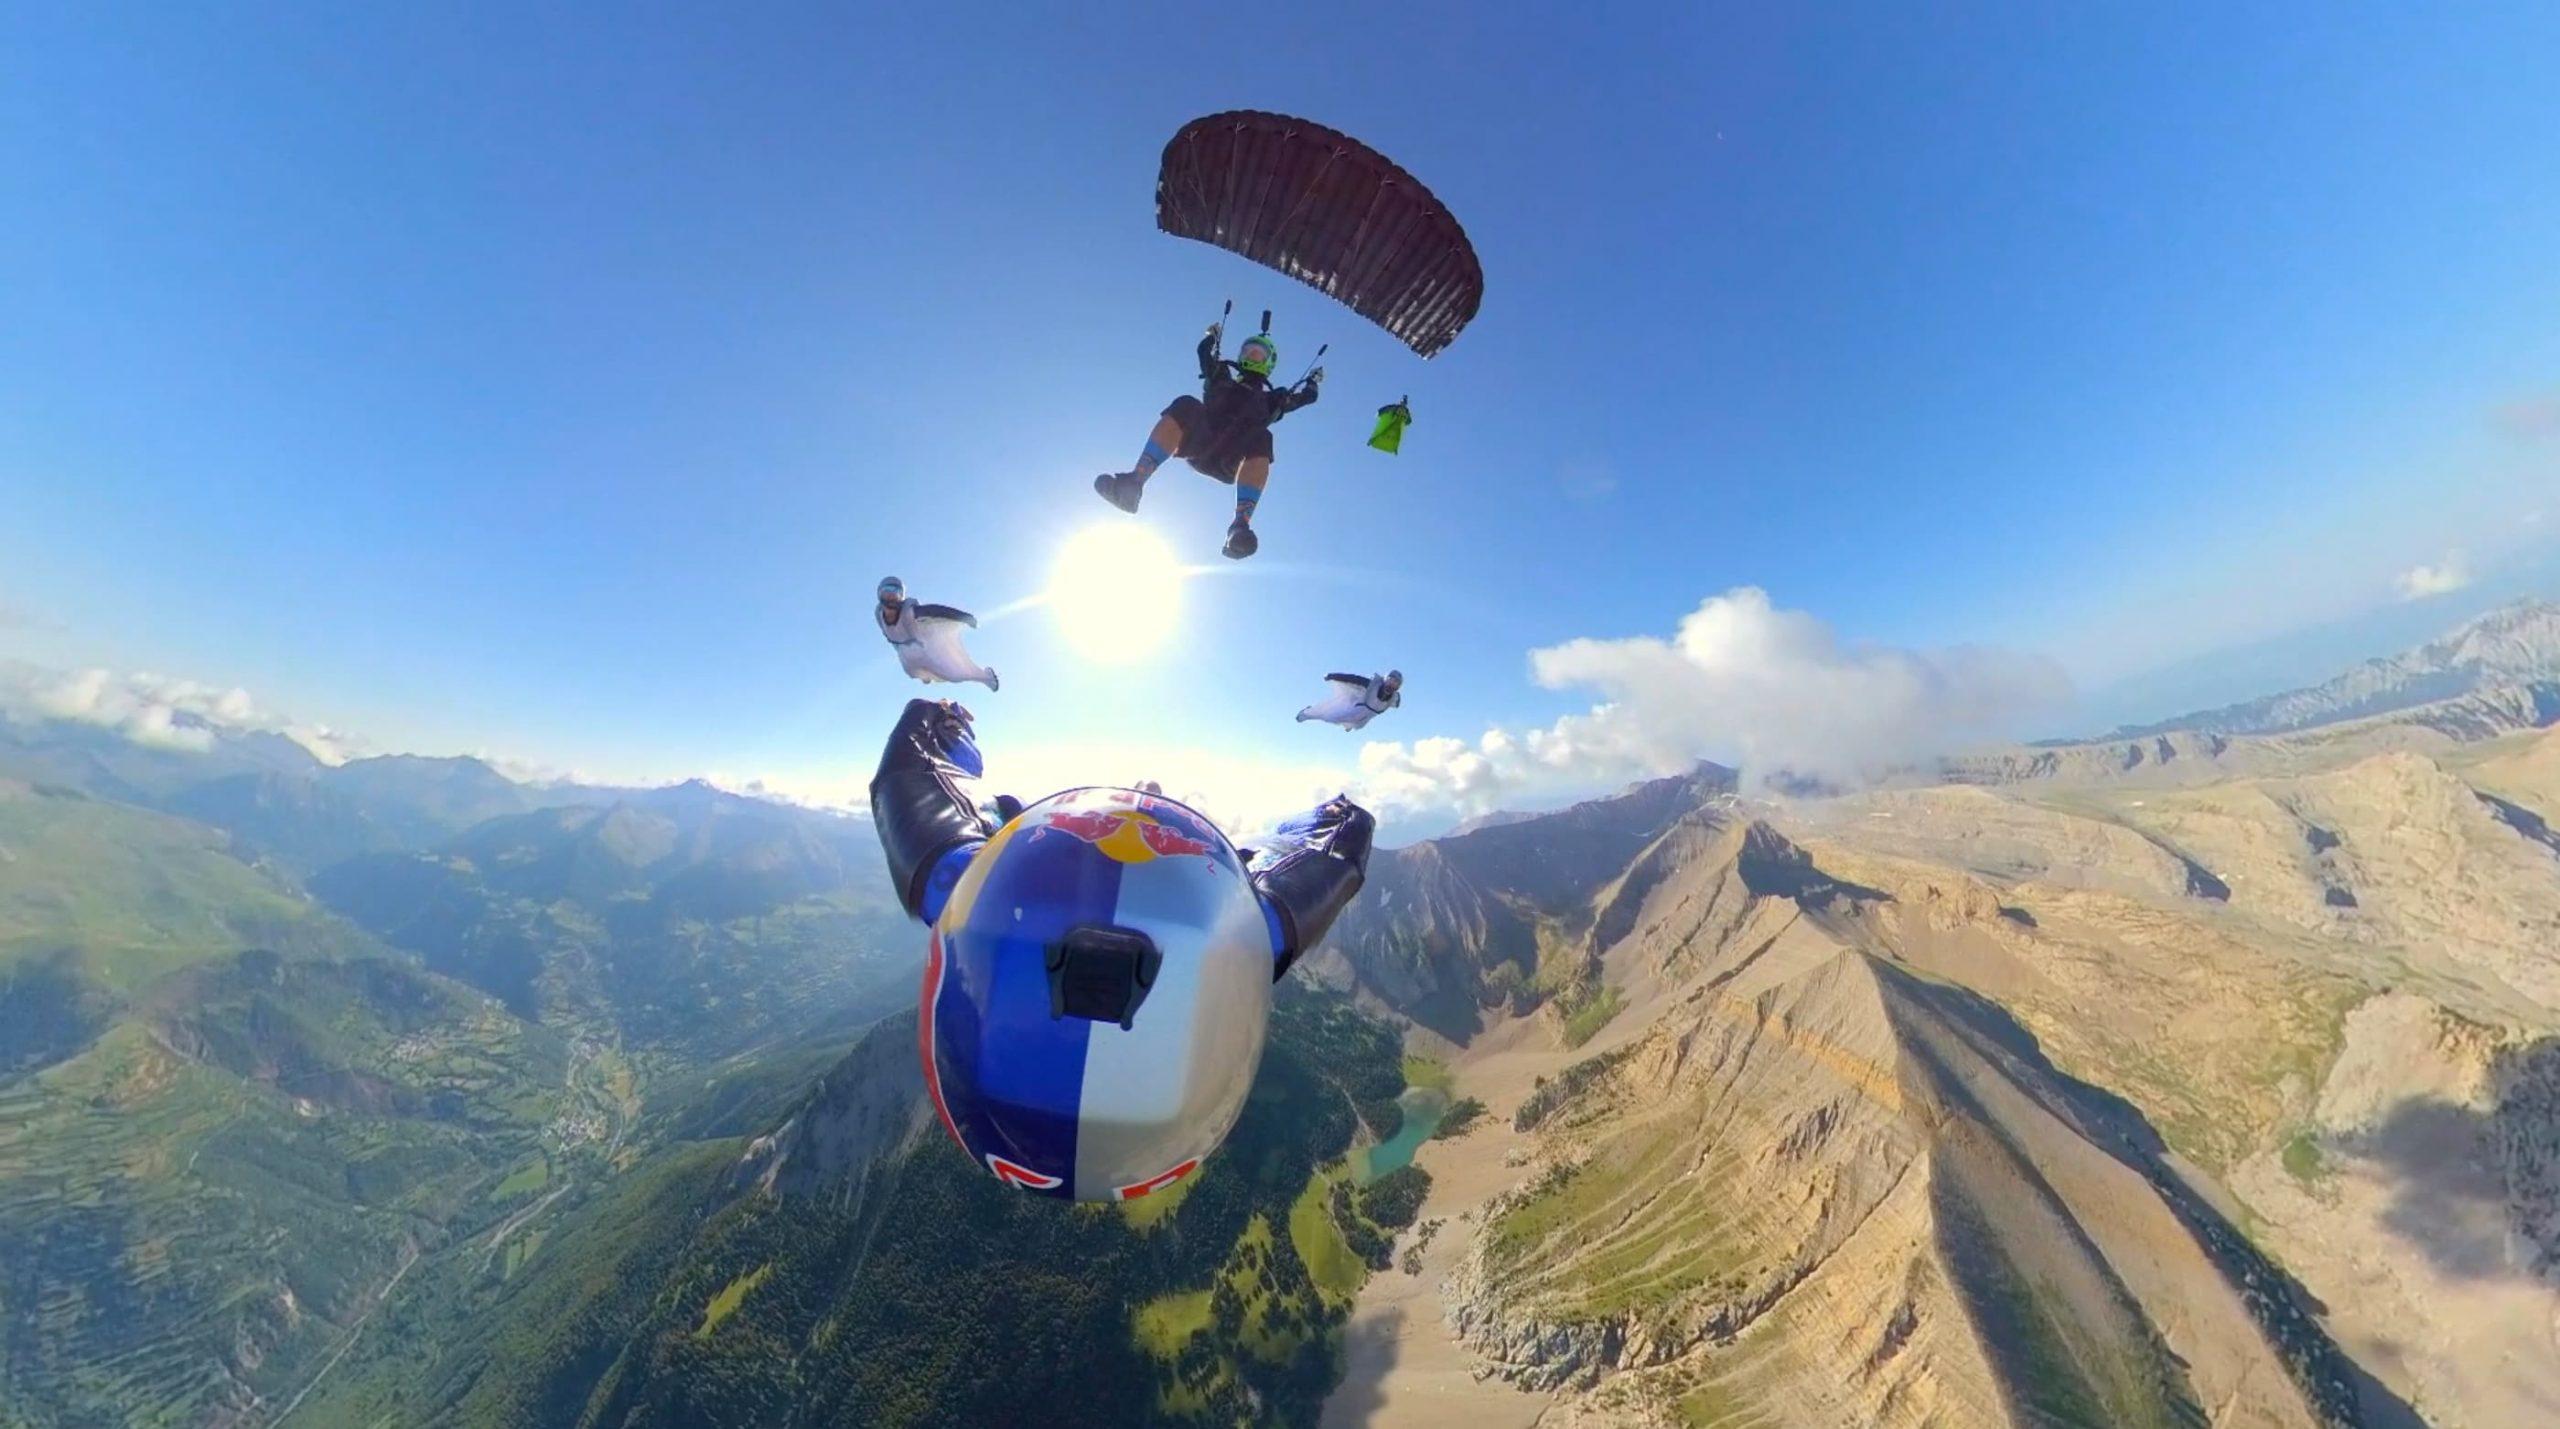 Pete Allum flies his parachute above wingsuiter Dani Roman